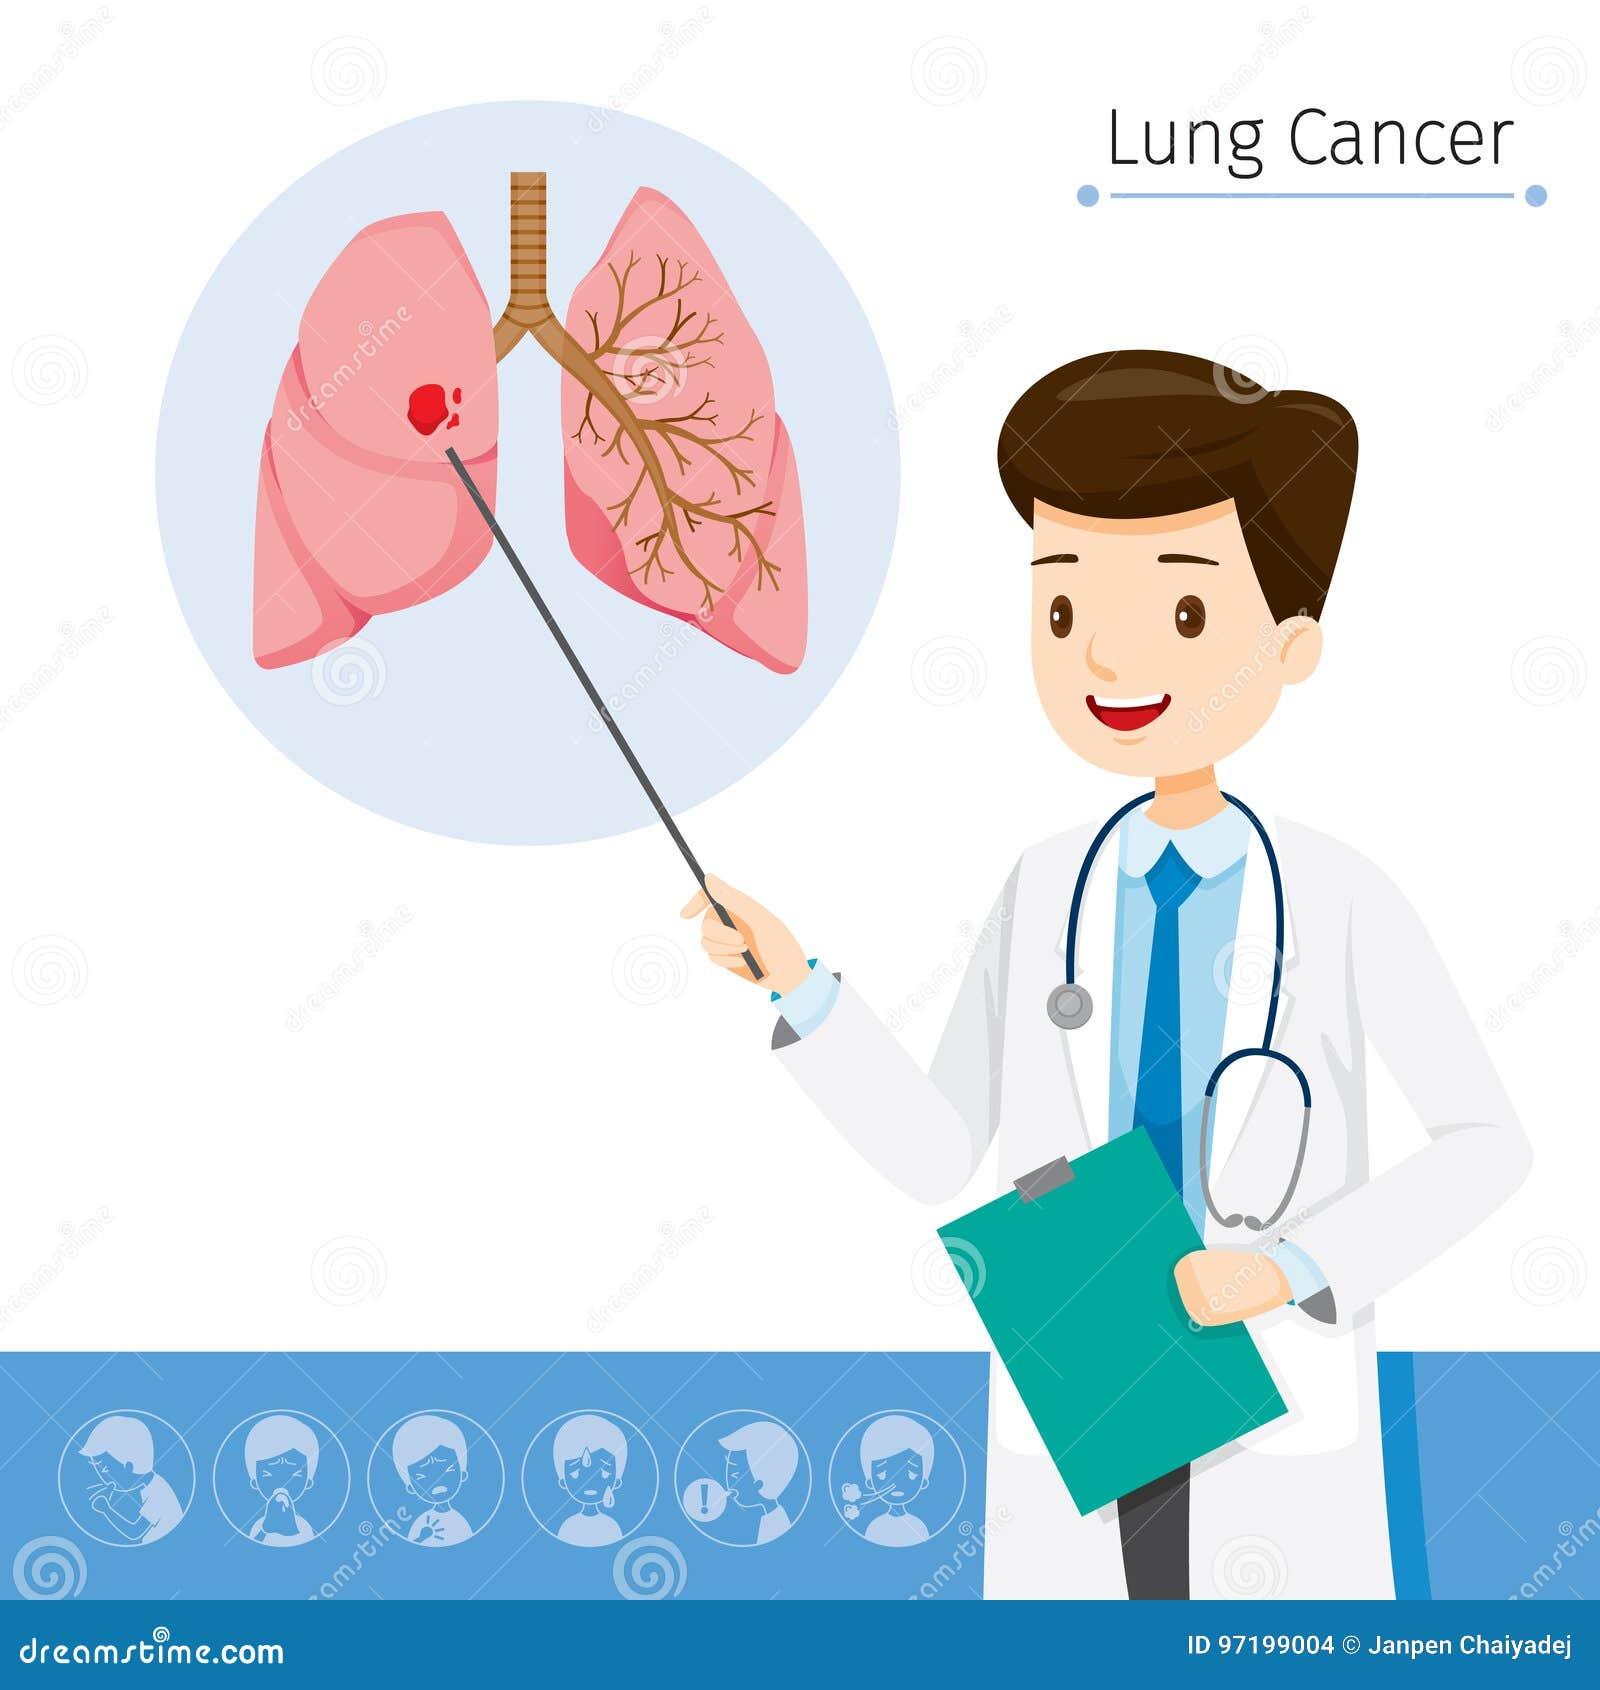 Doutor Describes About Cause a Lung Cancer